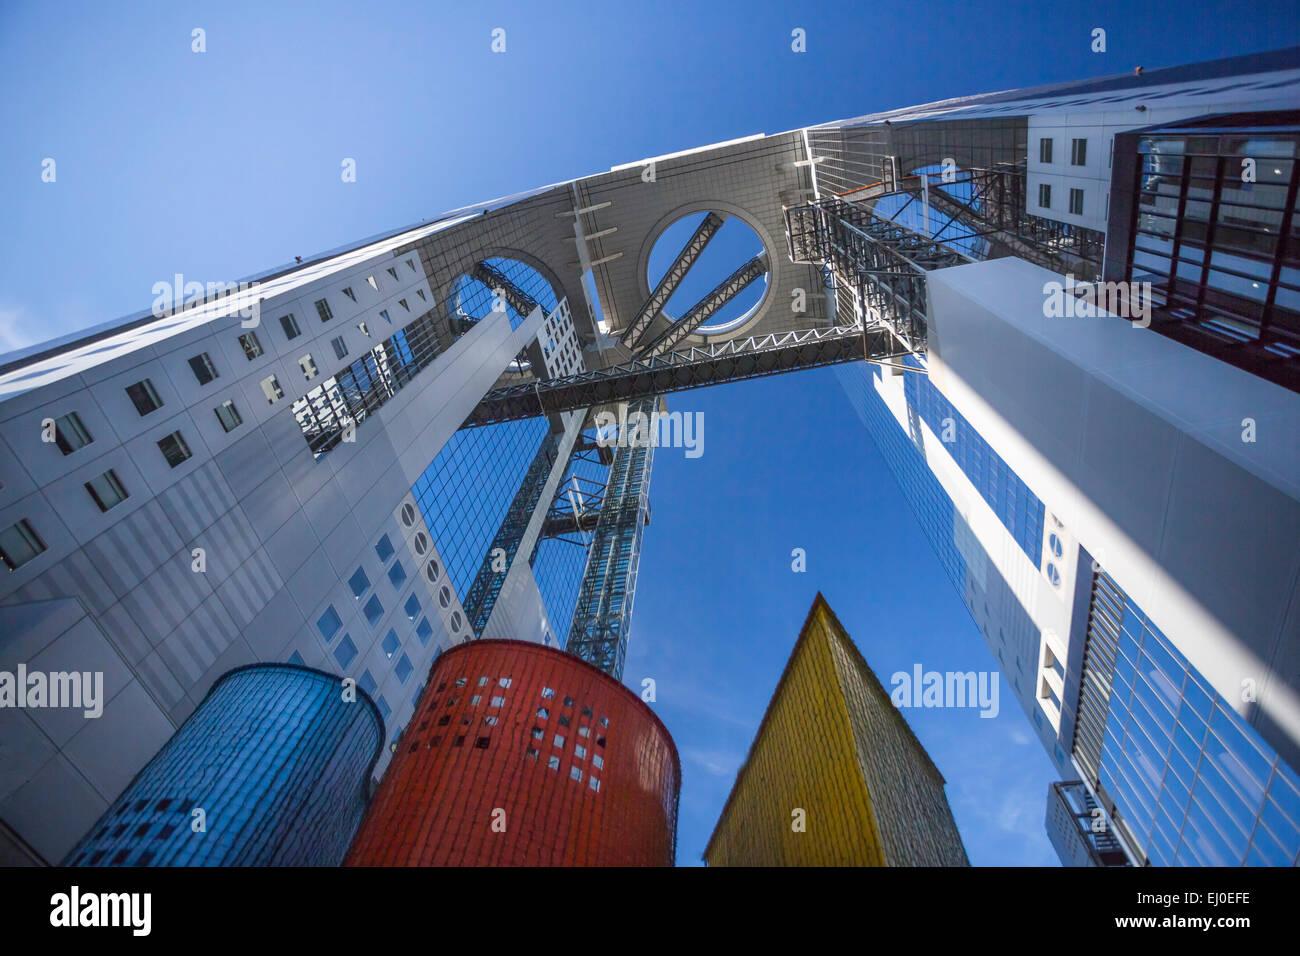 City, Japan, Asia, Kansai, Osaka, City, Umeda Sky, Building, architecture, colourful, touristic, travel - Stock Image